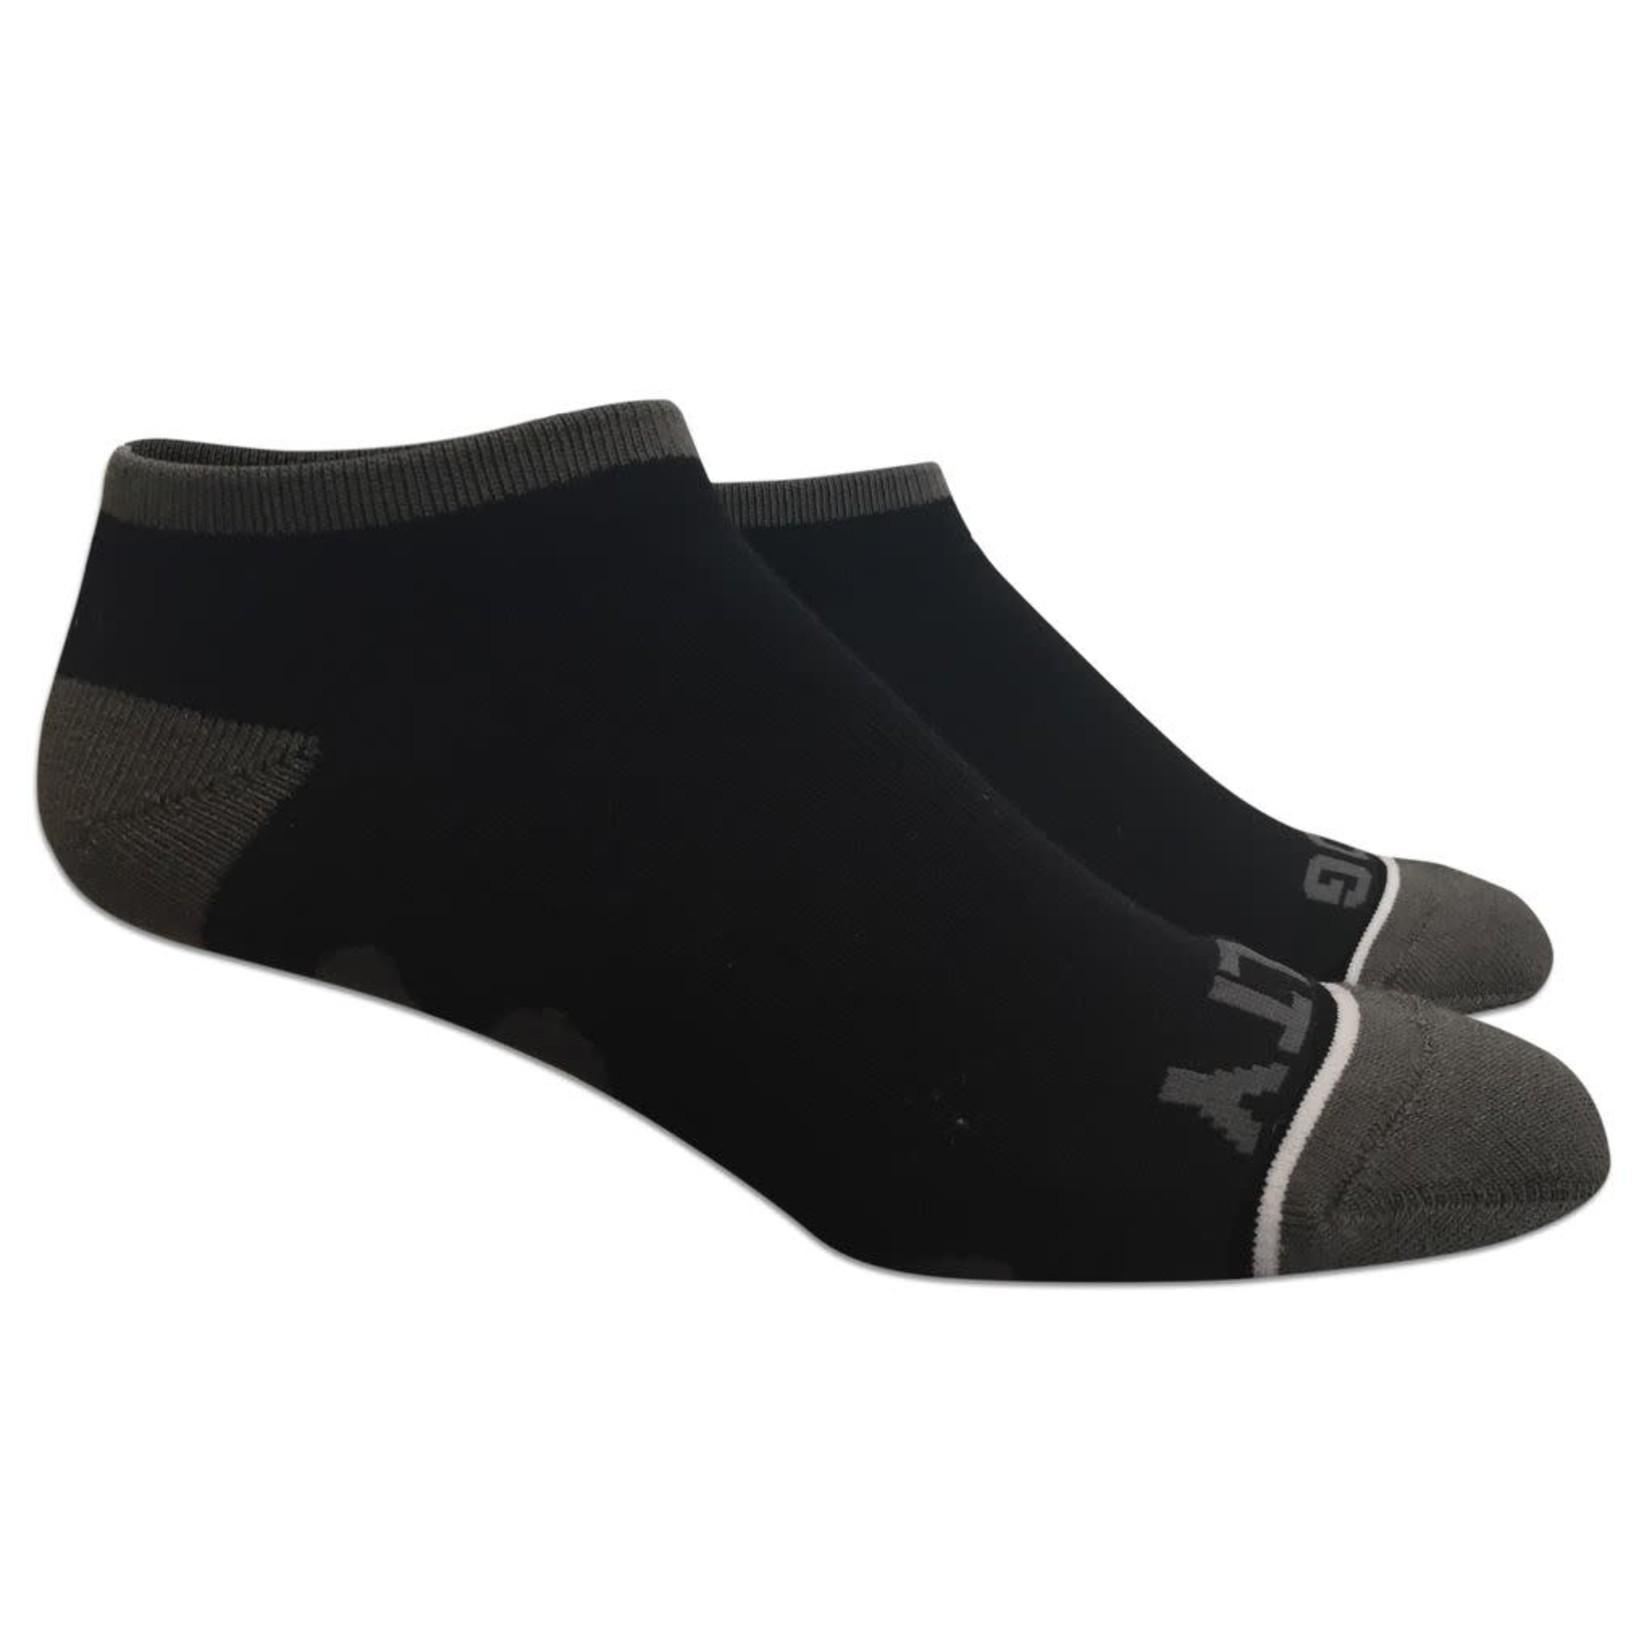 Socks-No Show Black/Gray